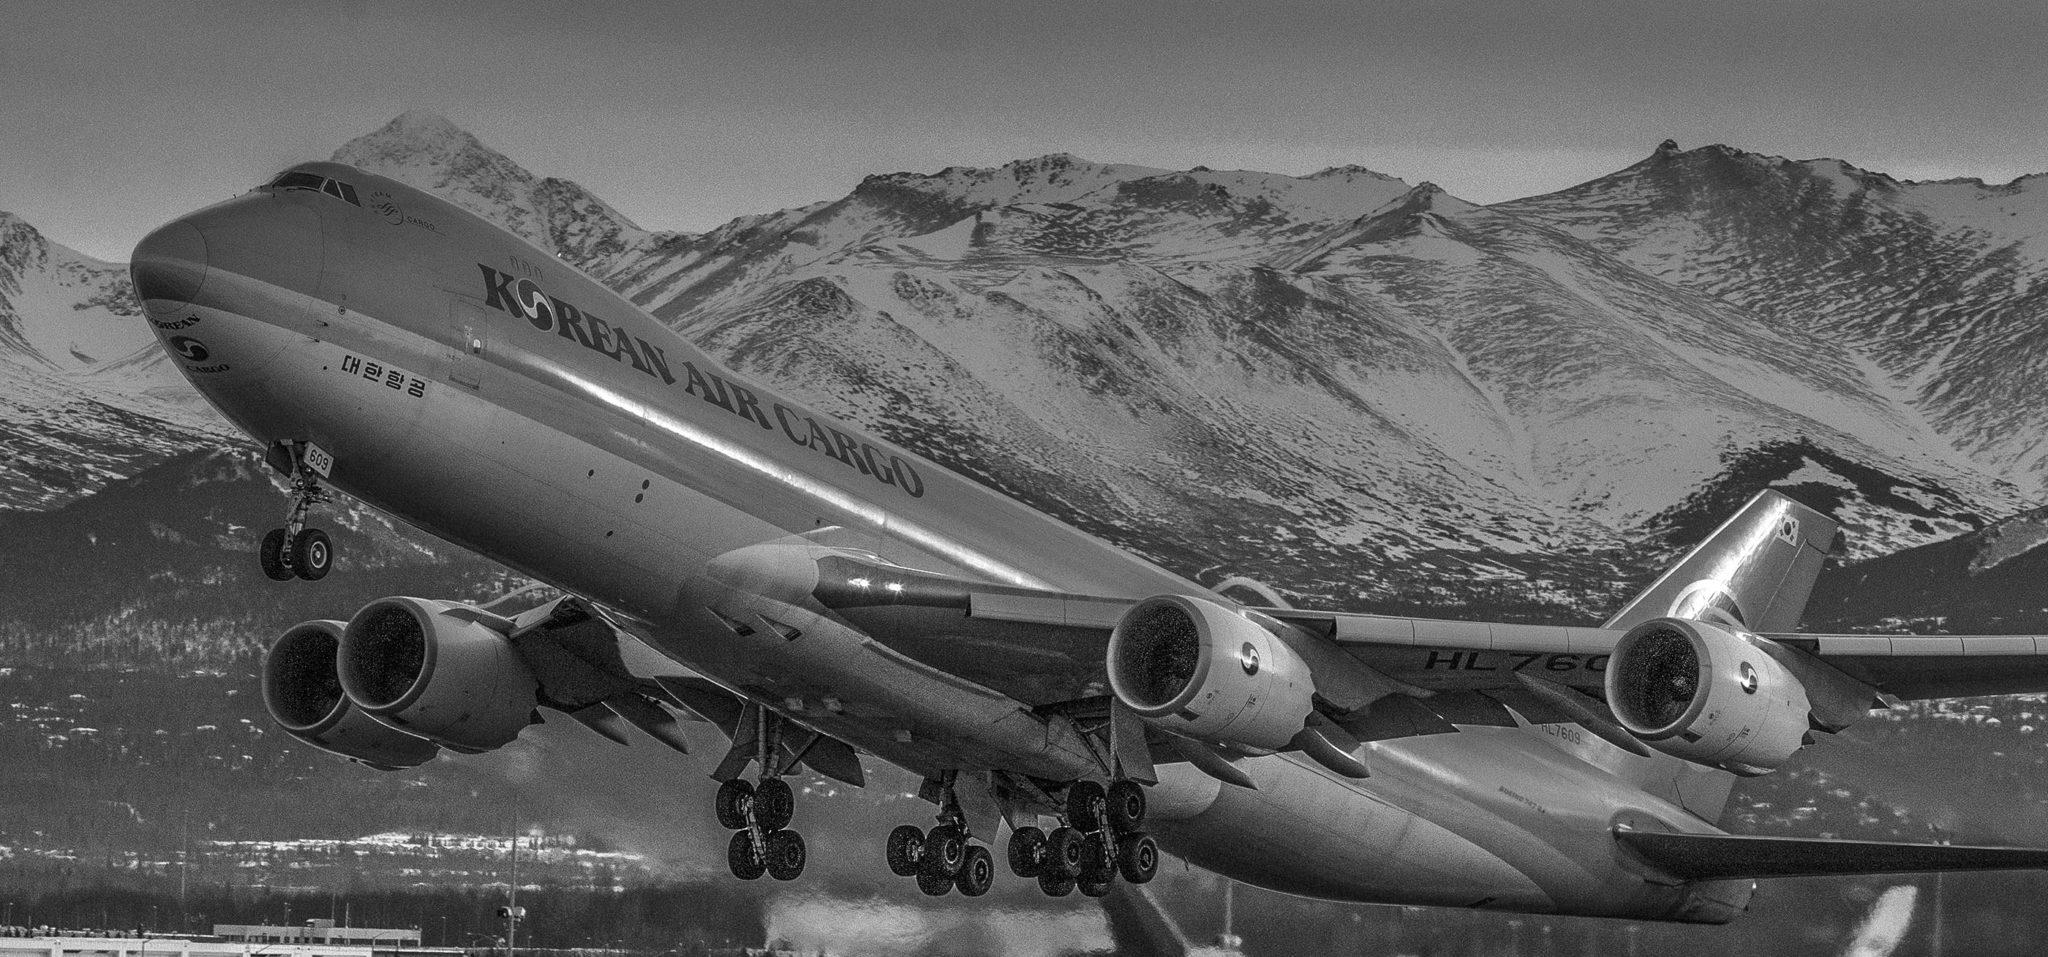 Alaska Air Cargo photography  Alaskafoto- Aircraft portraits & Aircraft photography of Alaska